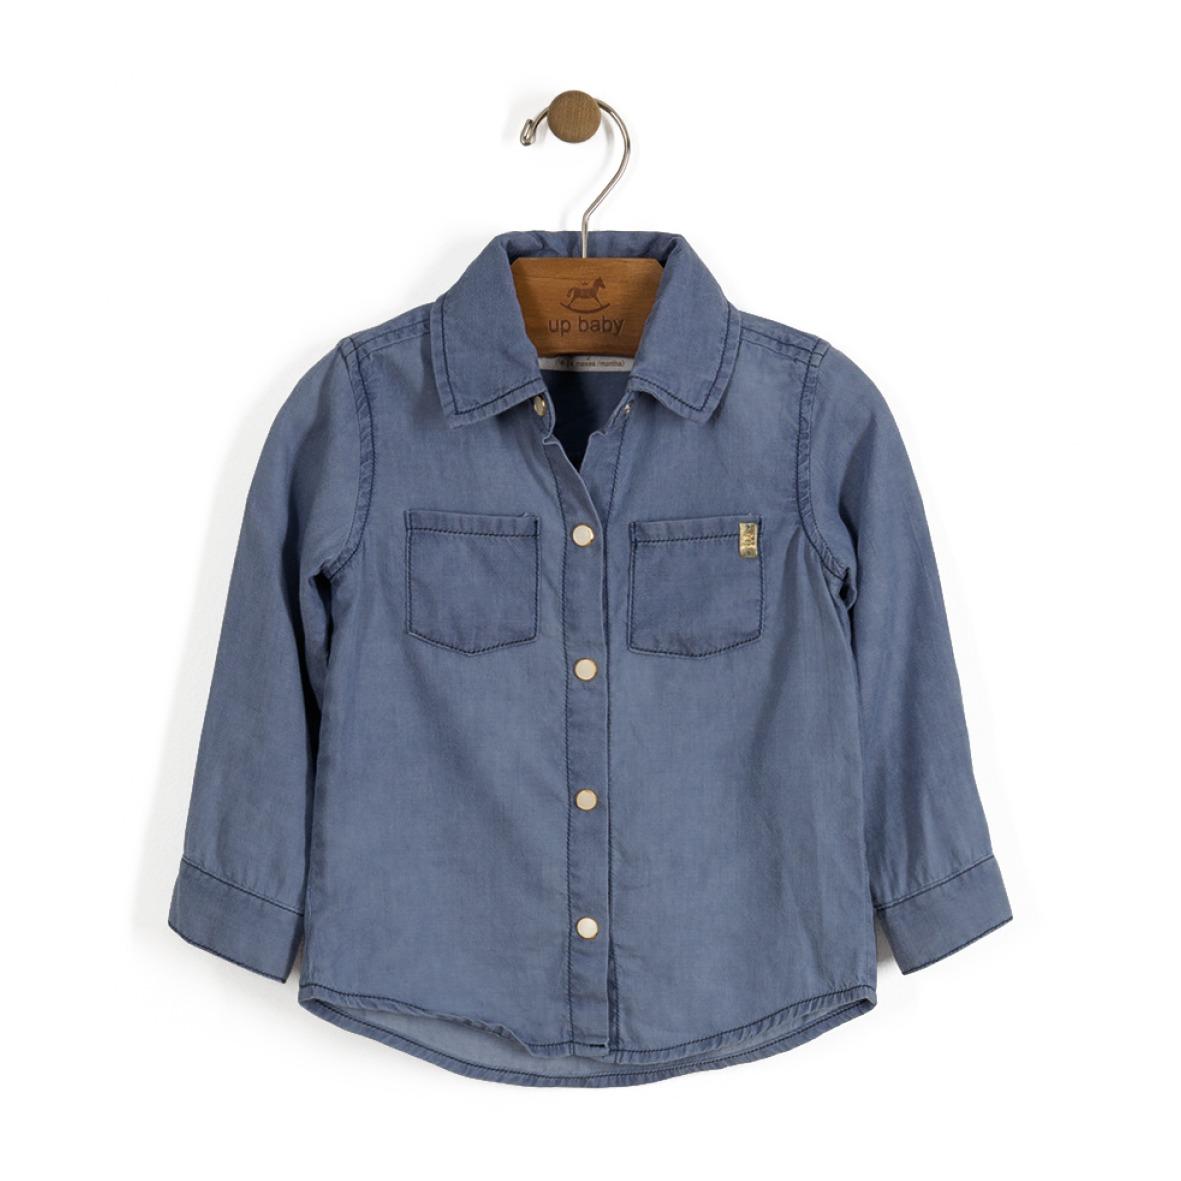 9685eb920c7cda Camisa Jeans Bebe Manga Longa Menina Up Baby